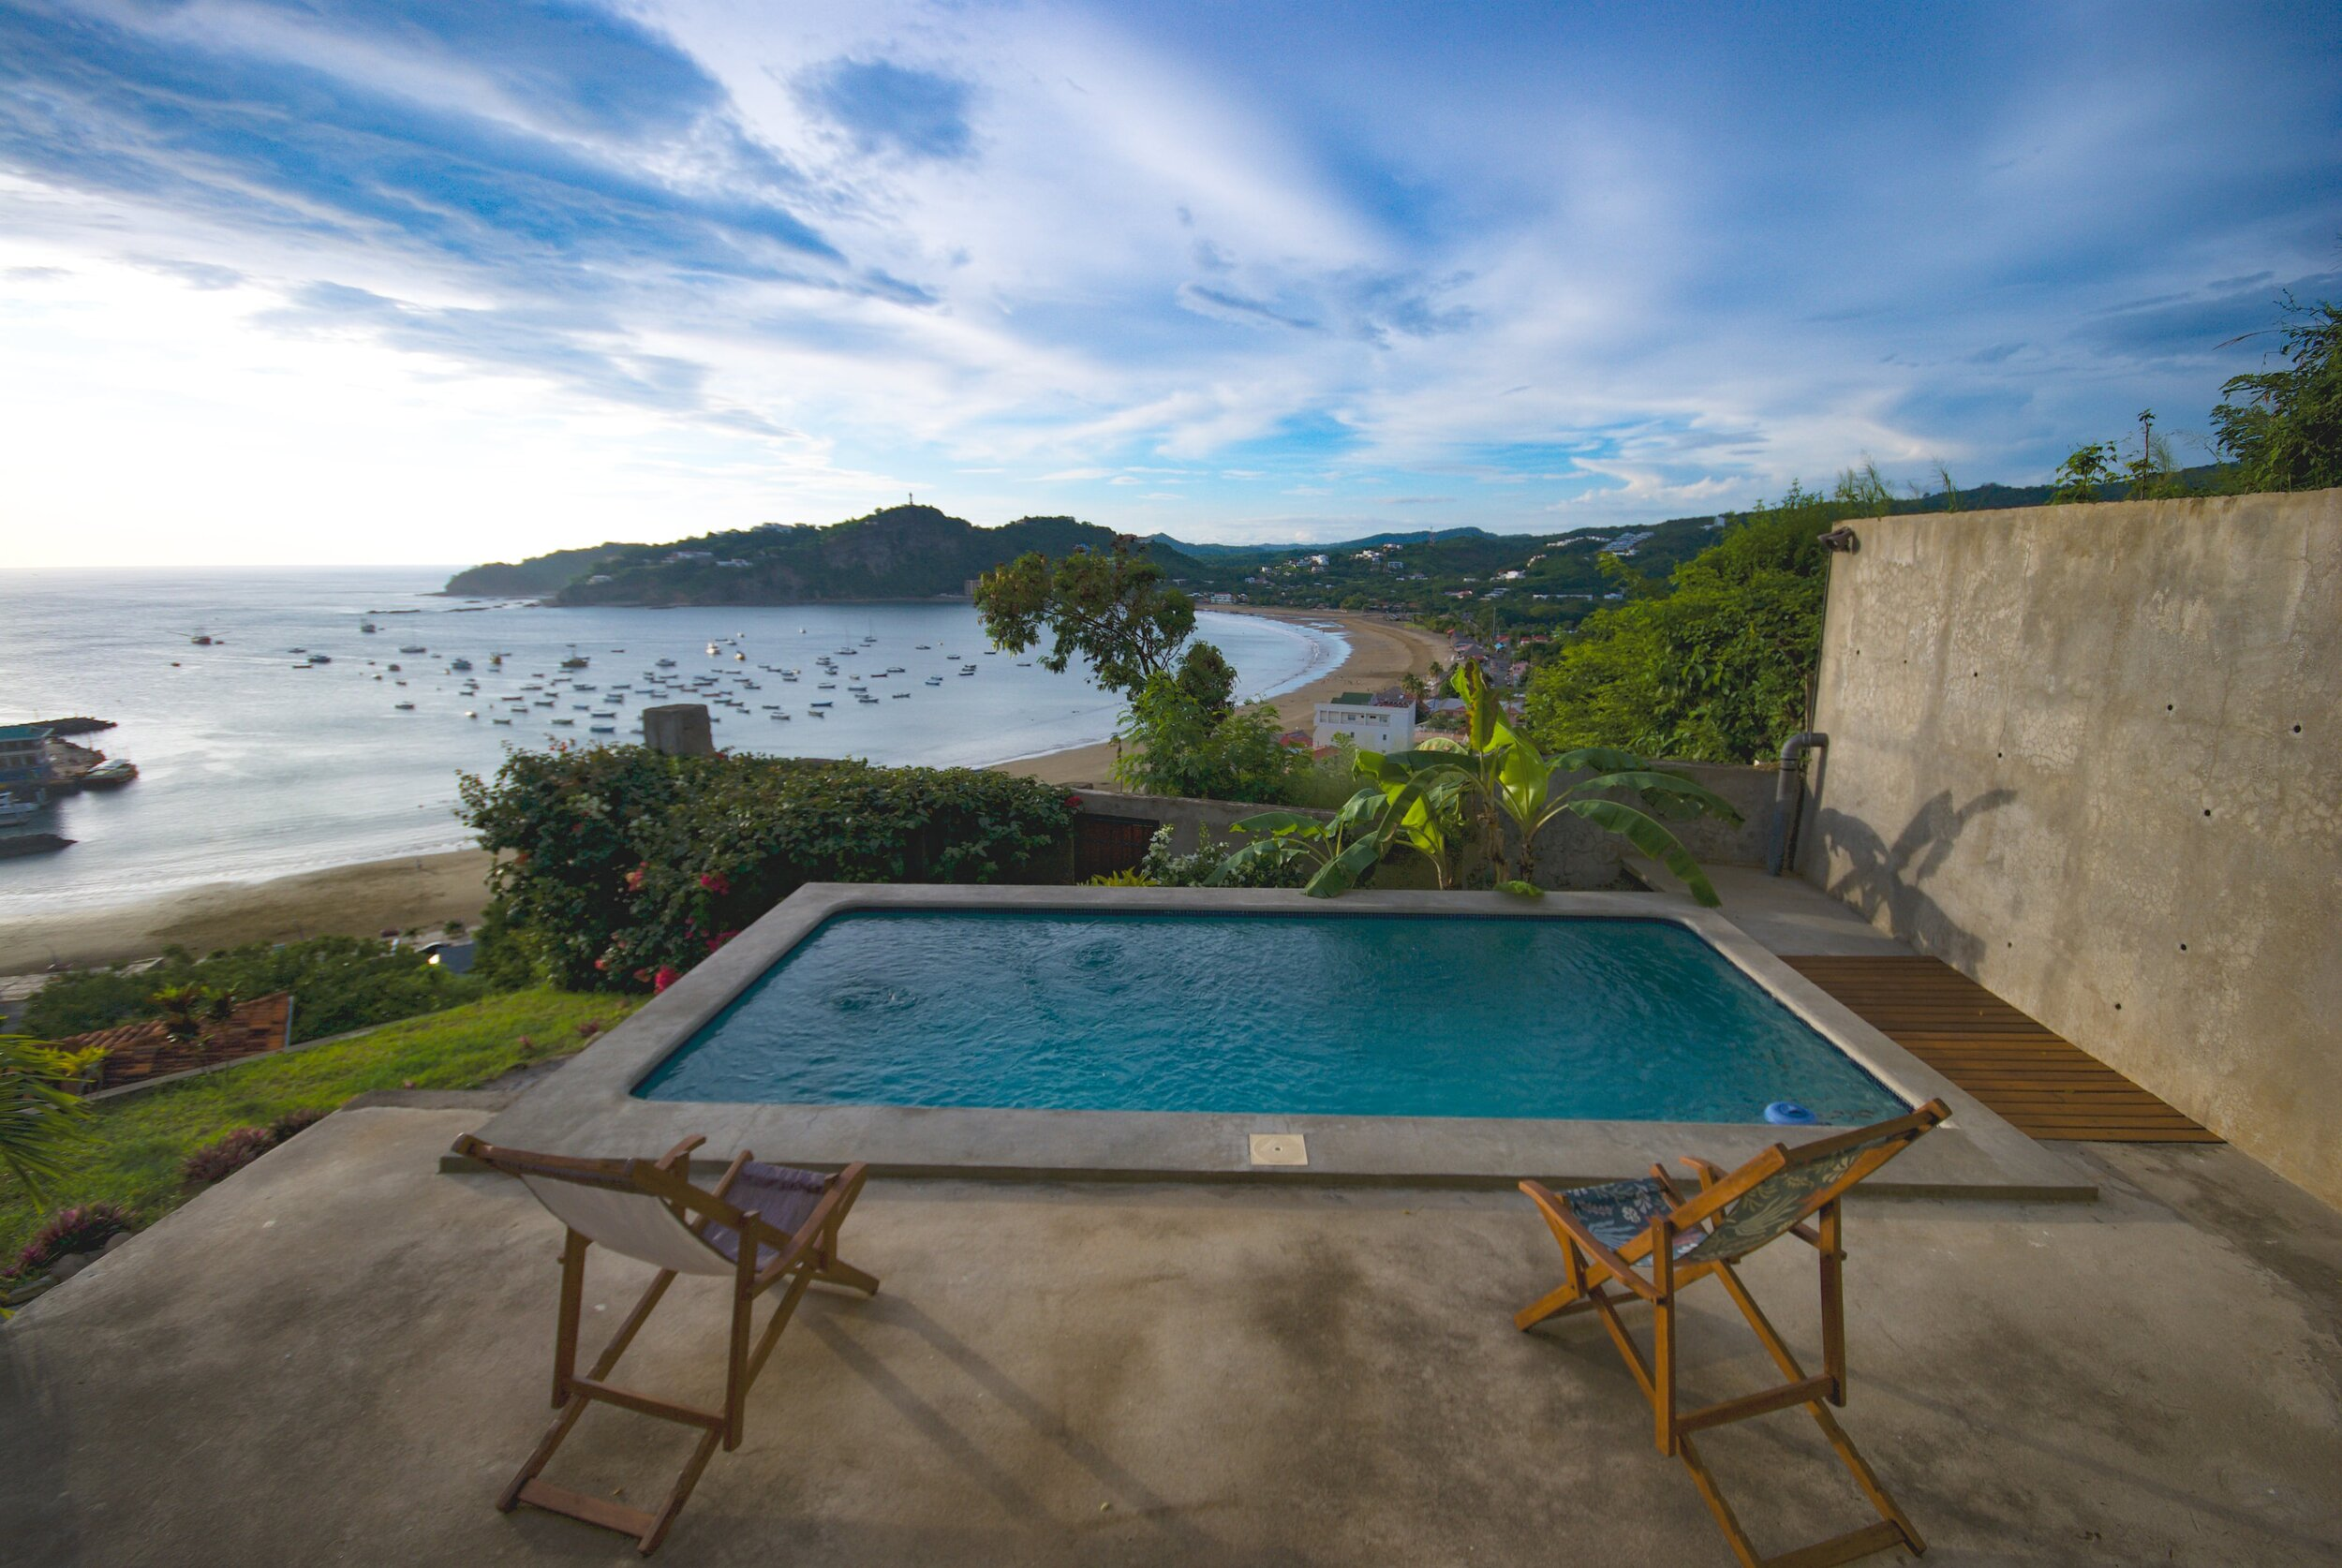 Ocean View Home For Sale San Juan Del Sur 13.jpg